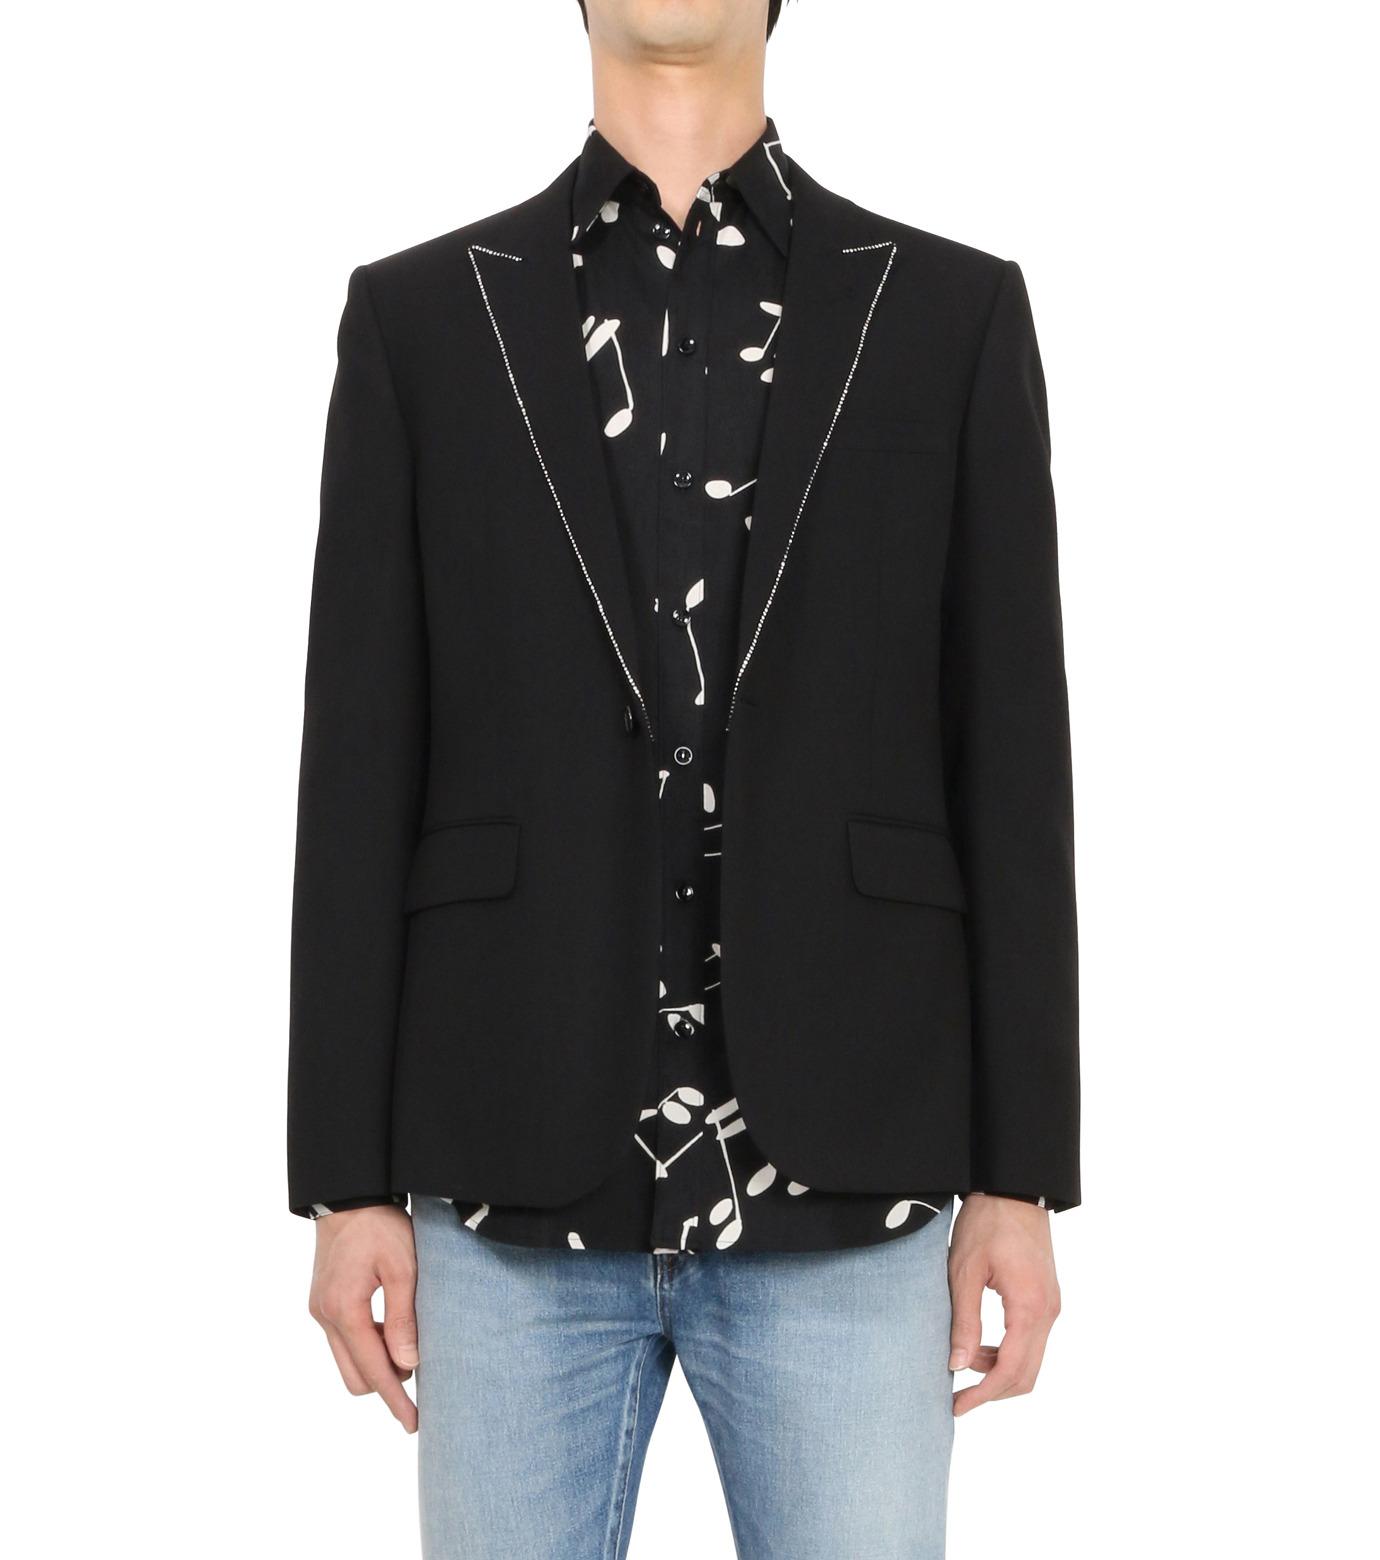 SAINT LAURENT(サンローラン)のStripe Jacket-BLACK(ジャケット/jacket)-394019-Y239W-13 拡大詳細画像1